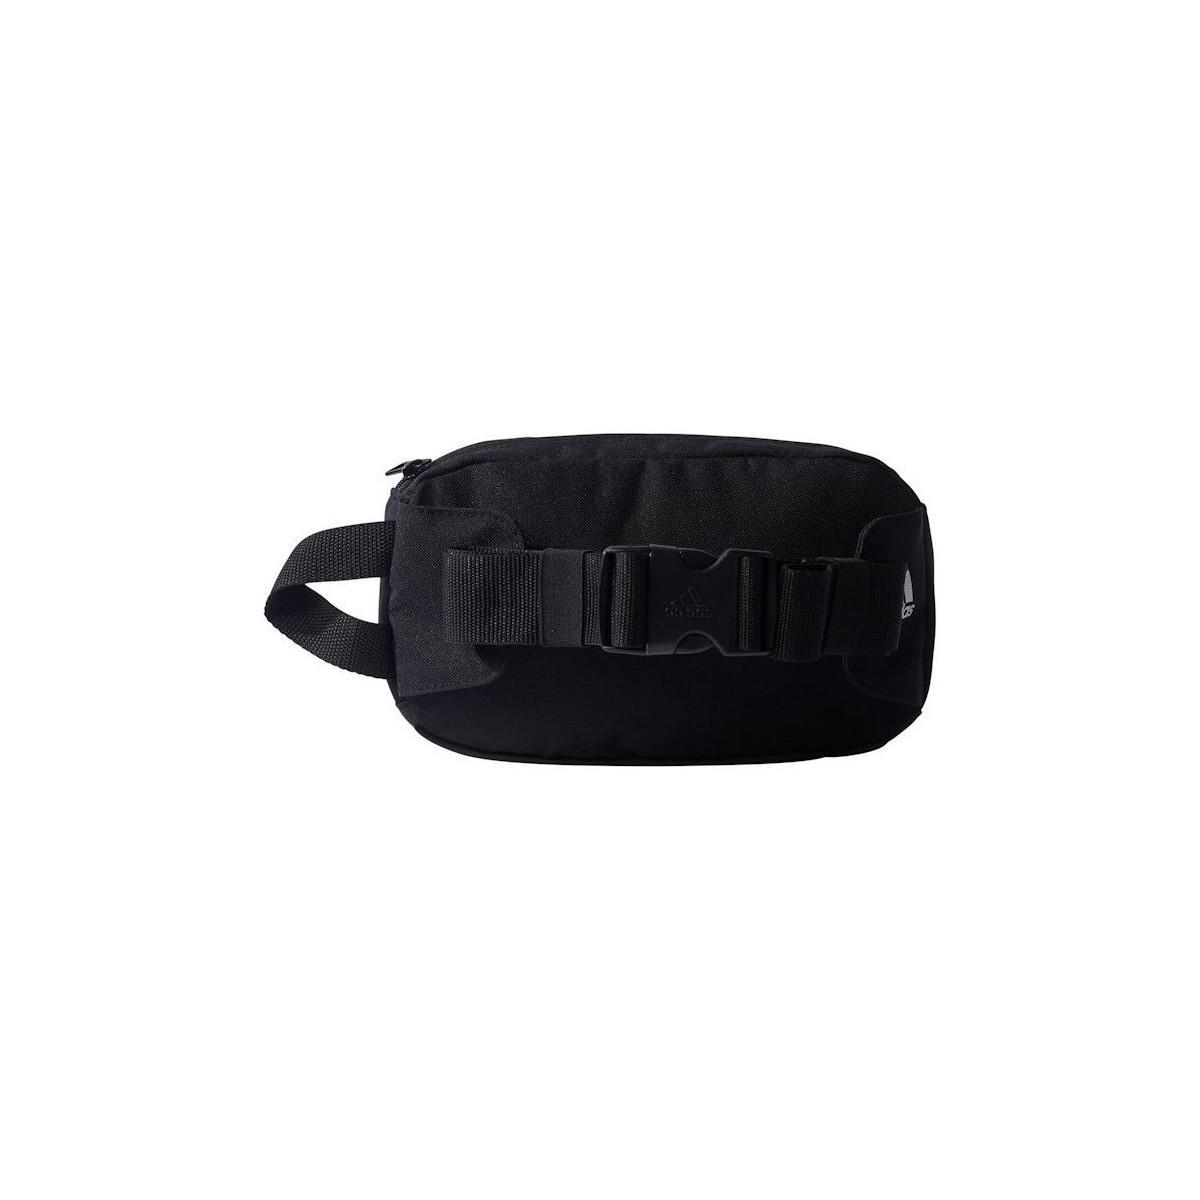 adidas Lin Per Waistbag Women s Hip Bag In Black in Black - Lyst 537c9c4fd2b26